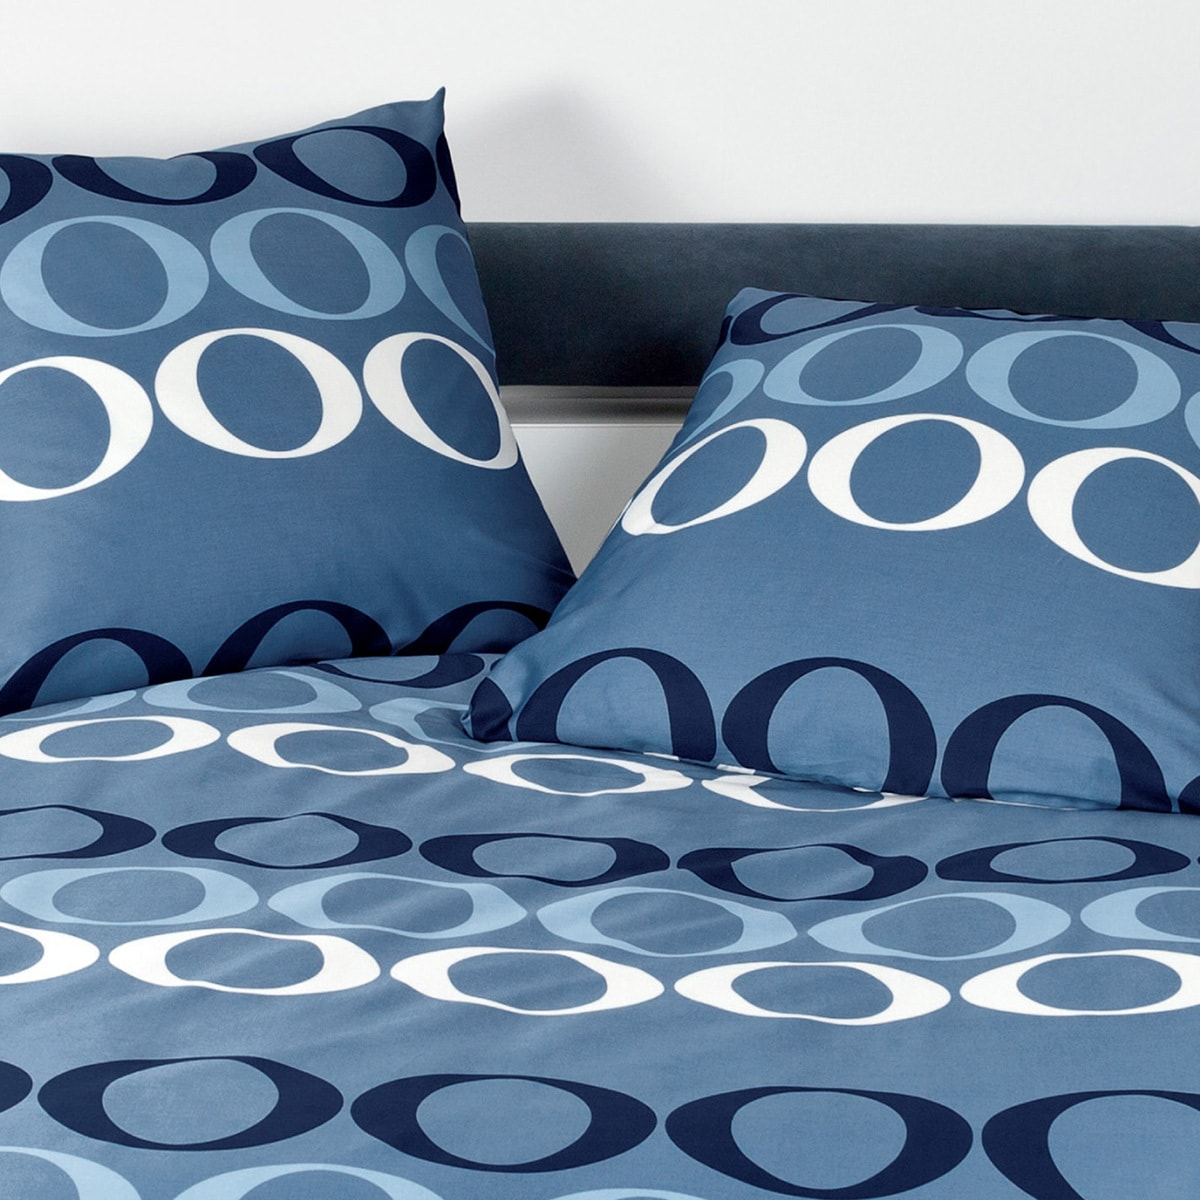 janine mako satin bettw sche j d 87034 02 g nstig online kaufen bei bettwaren shop. Black Bedroom Furniture Sets. Home Design Ideas